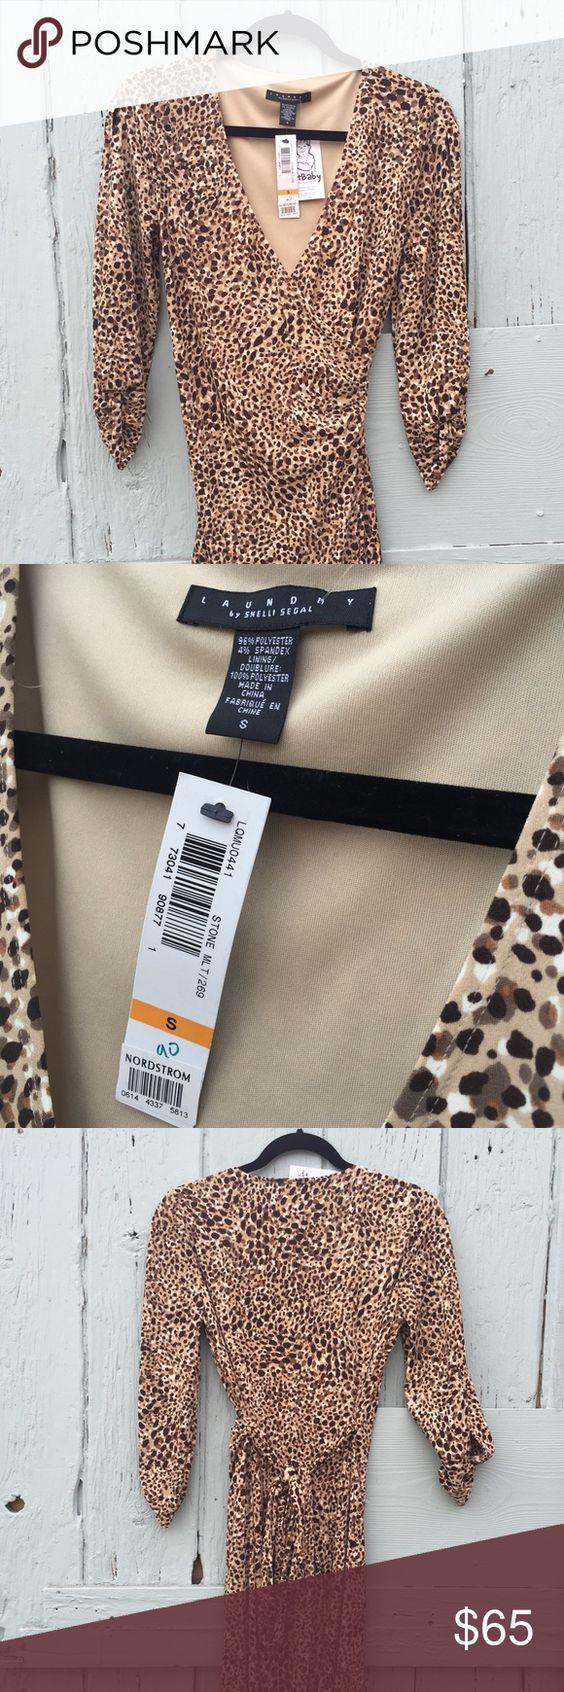 Laundry by Shelli Segal Leopard Print Wrap Dress Laundry by Shelli Segal Leopard Print Wrap Dress. Laundry by Shelli Segal Dresses